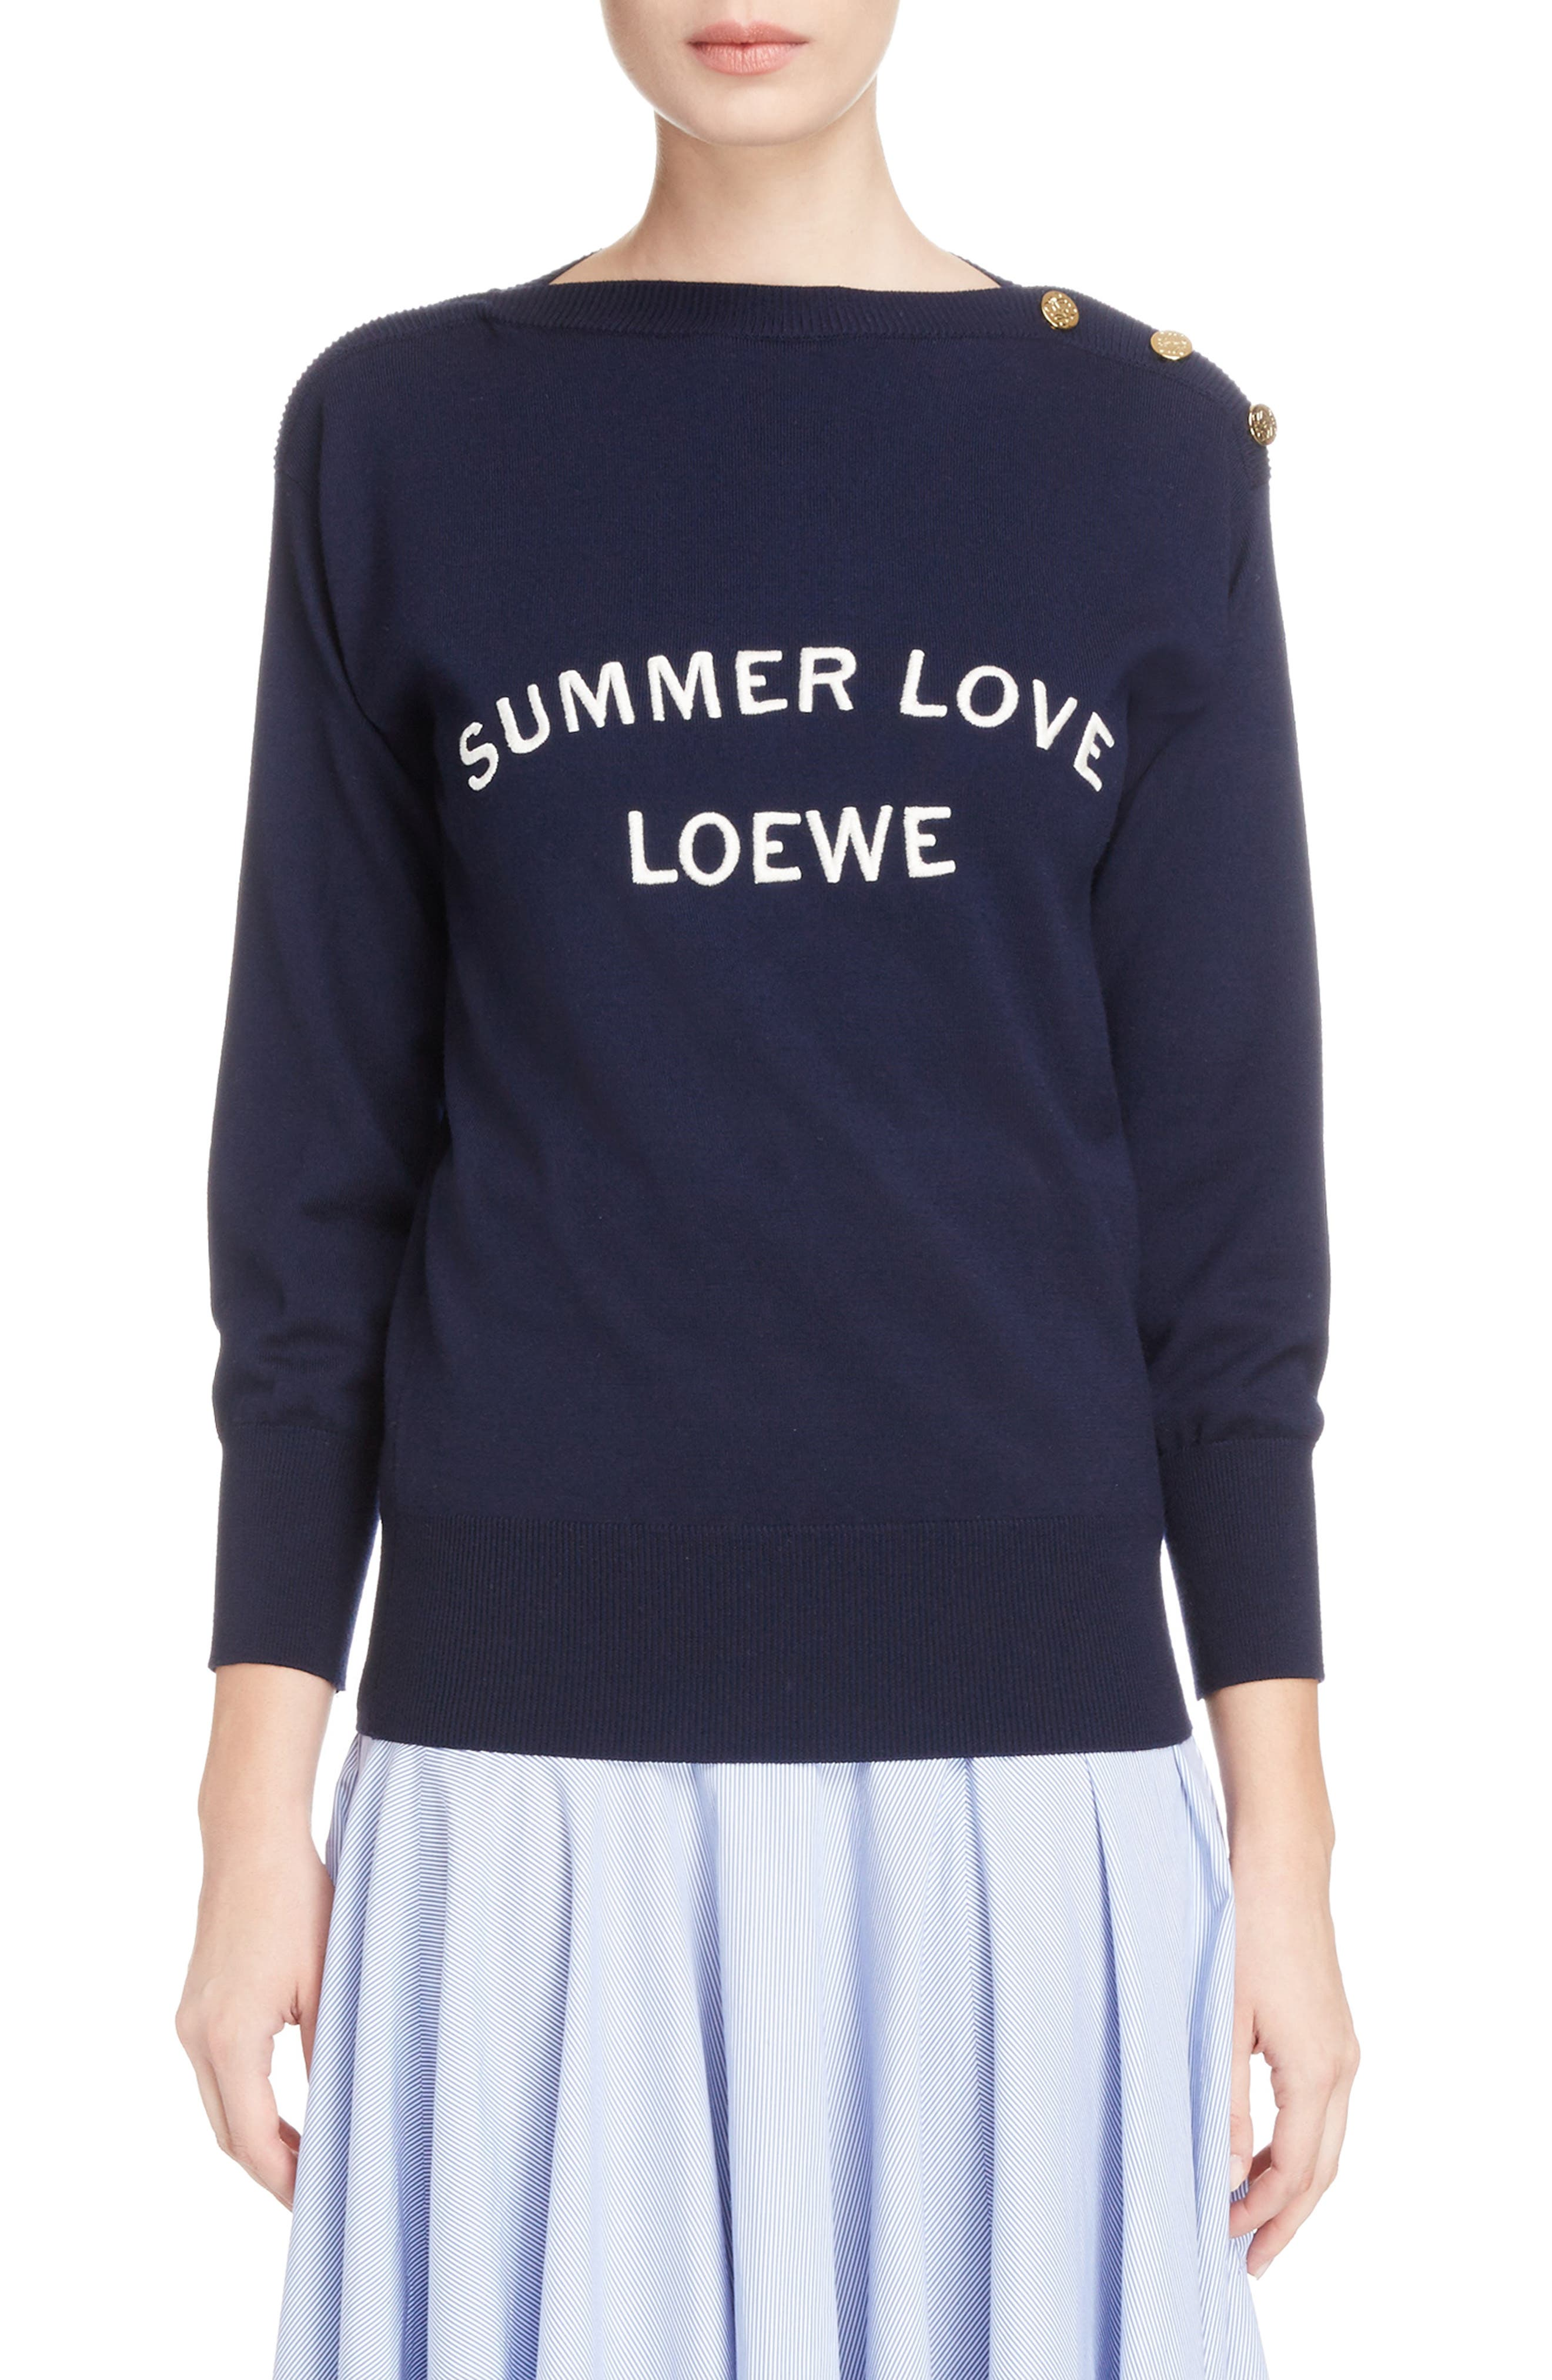 Designer Sweaters: Cardigans, Crewneck & Pullovers | Nordstrom